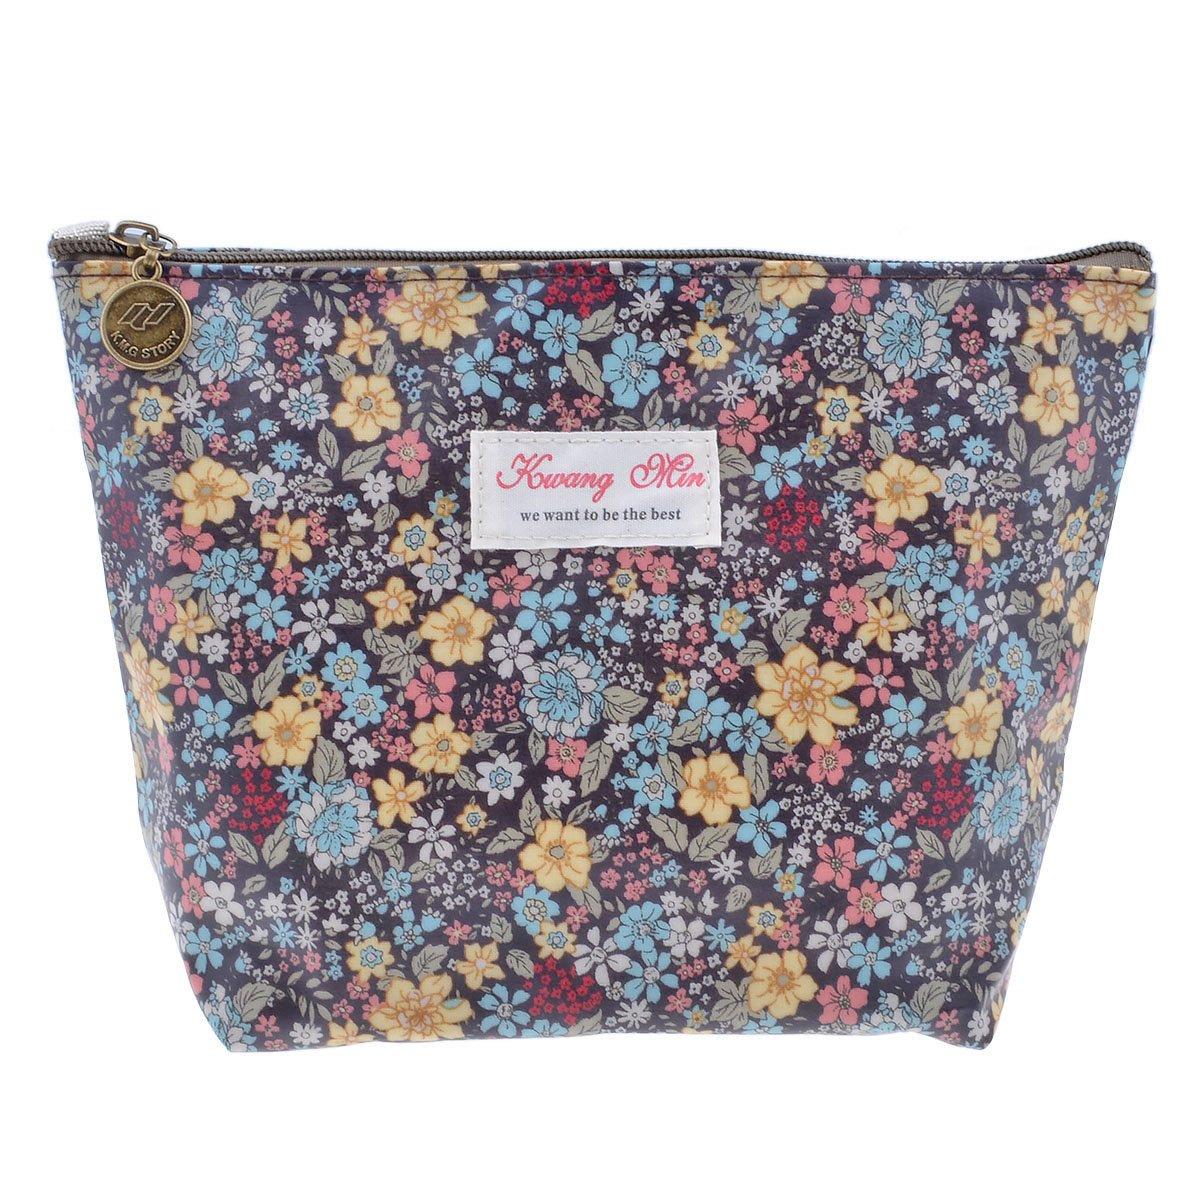 Parateck Floral Print Zipper Cosmetic Makeup Case Pouch Travel Bag Tote, Large (Black)